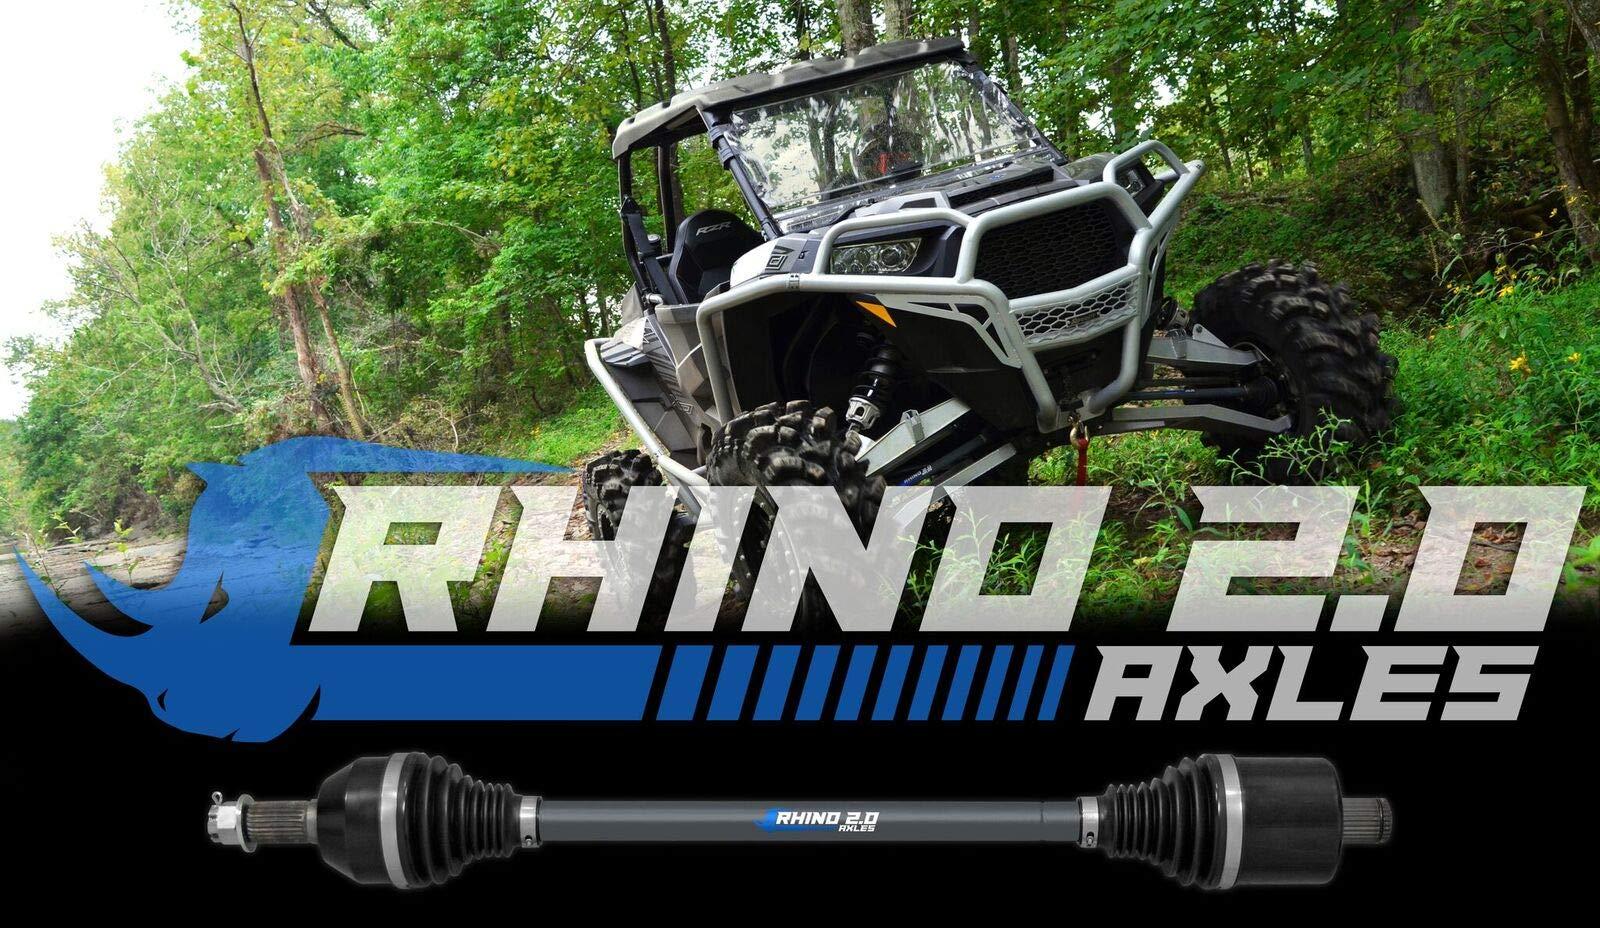 SuperATV Heavy Duty Rhino 2.0 Stock Length Axle for Polaris RZR XP 1000 High Lifter Edition (2016) - FRONT by SuperATV.com (Image #7)